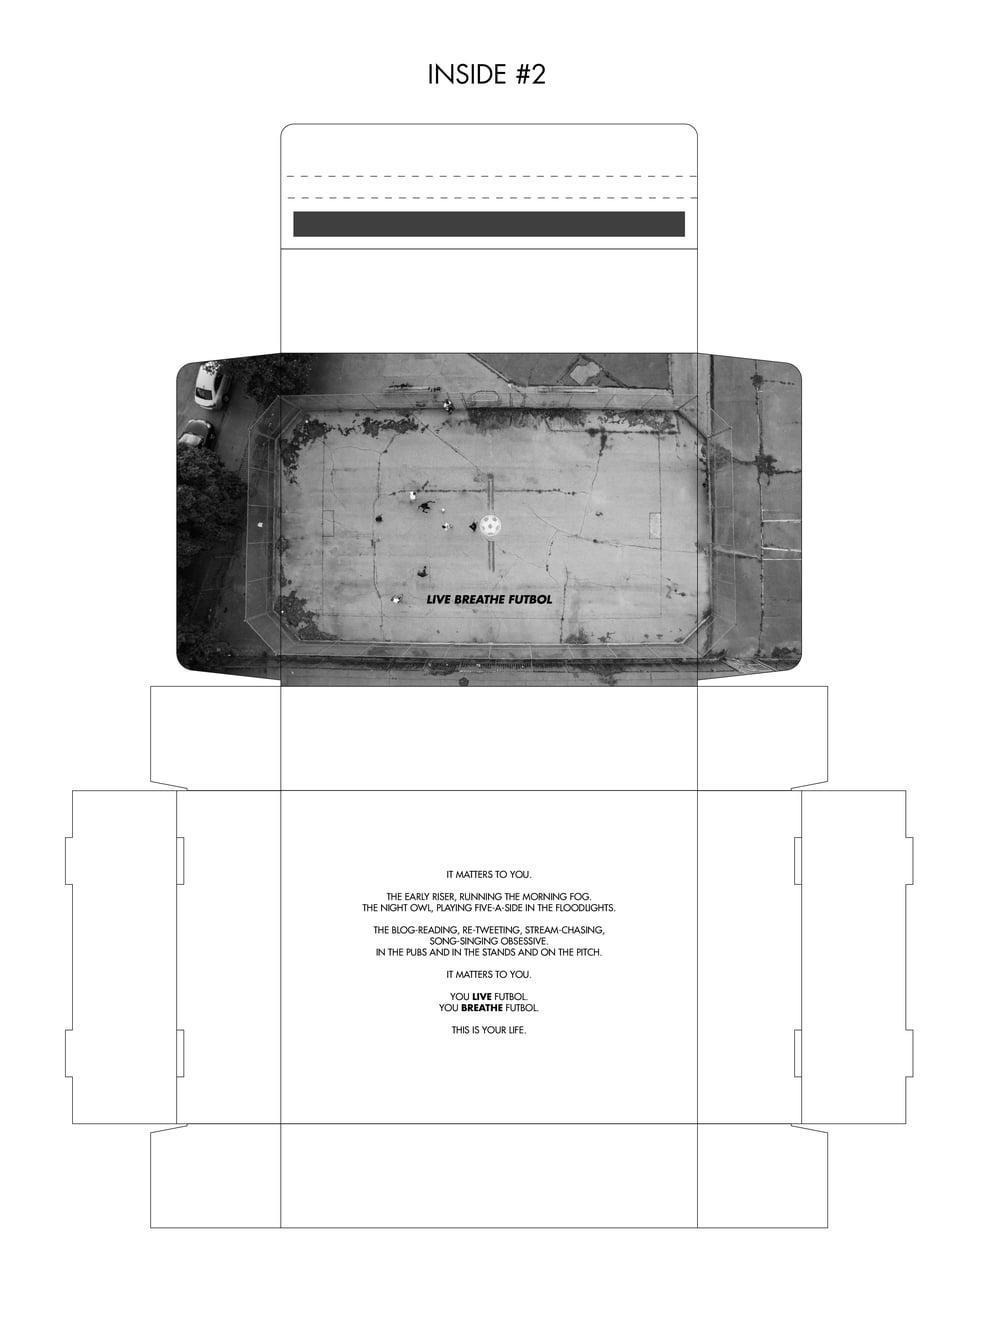 LBF_ship box